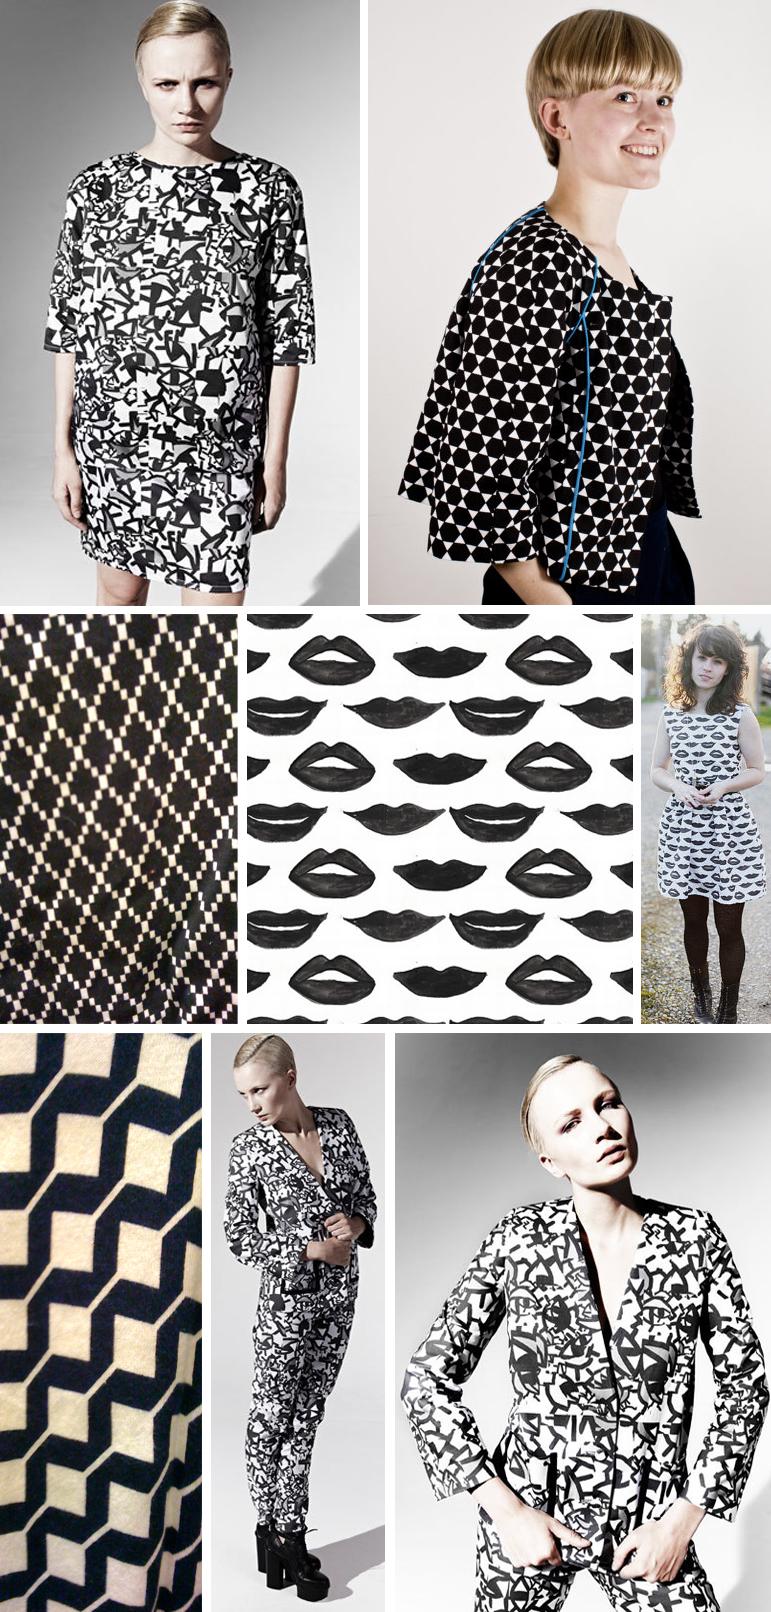 Graphic monochrome street patterns